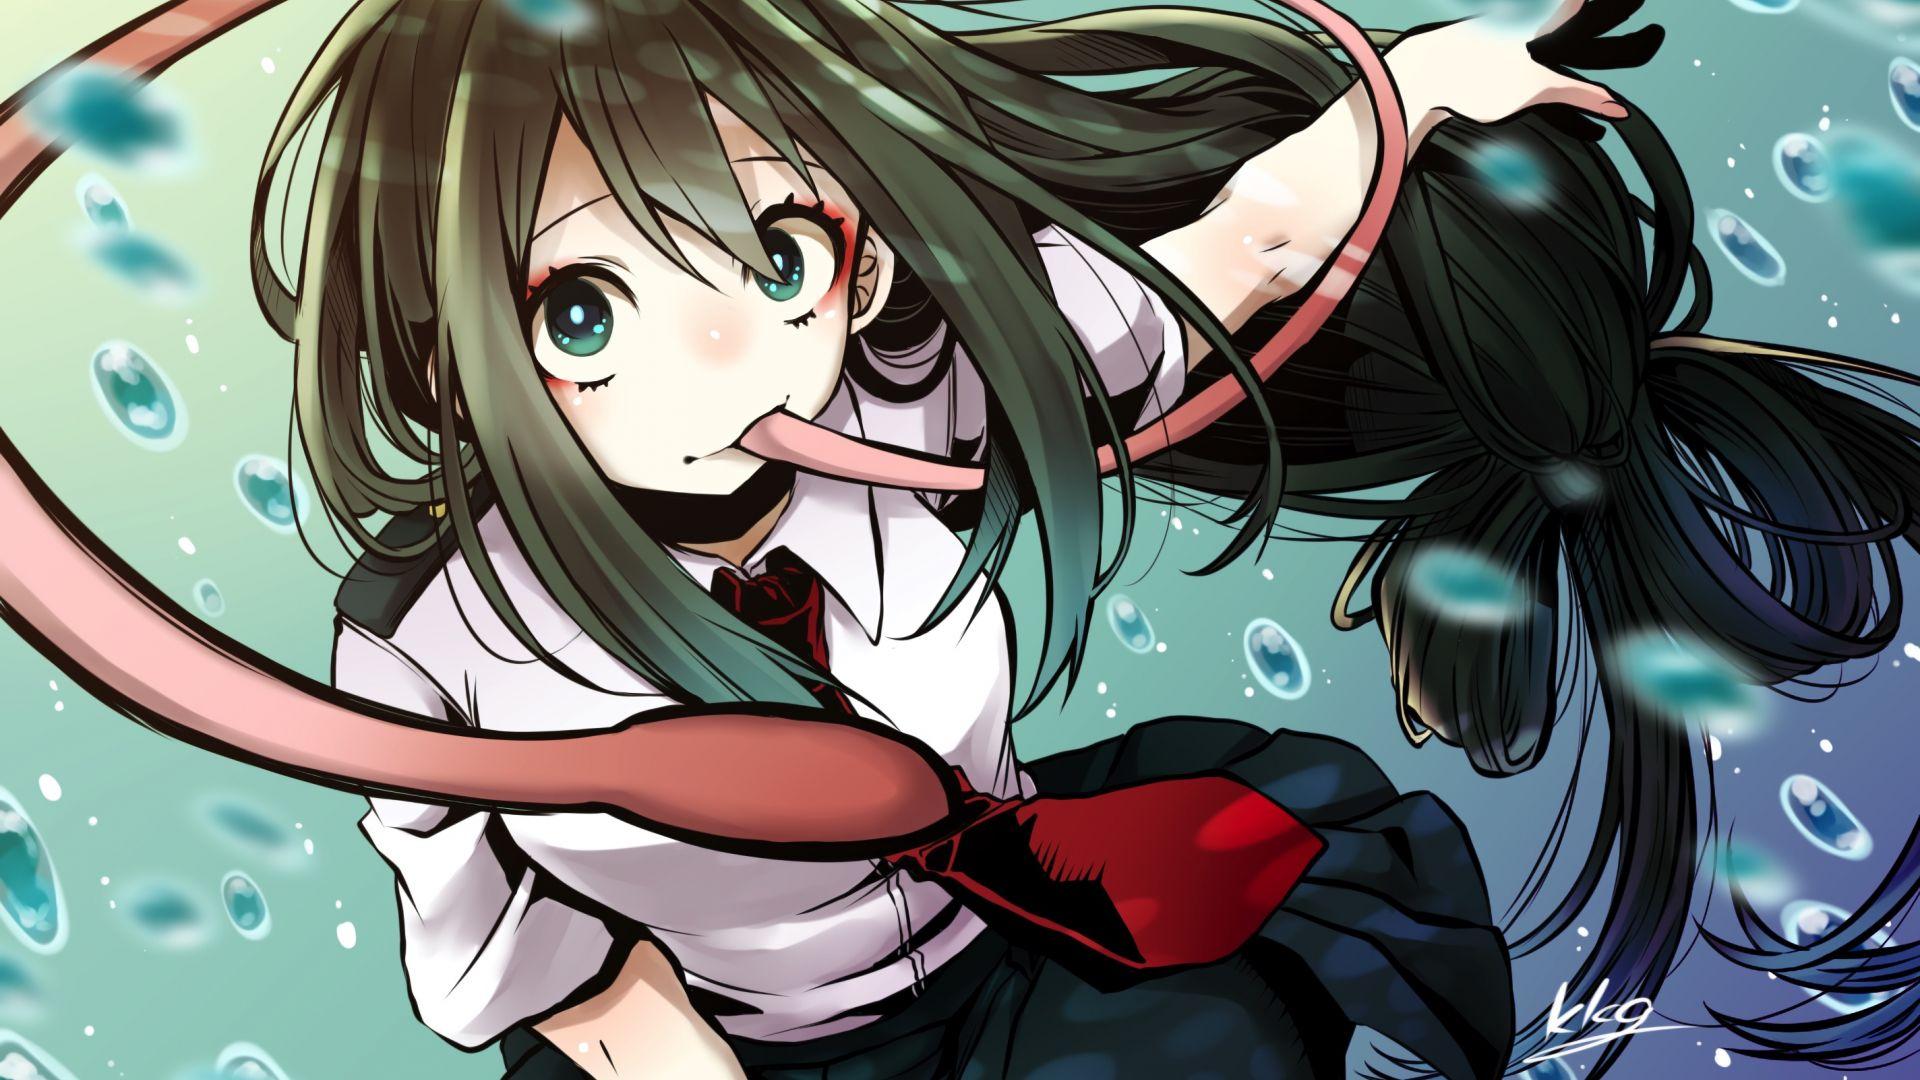 Cute Anime Couple Wallpaper Hd For Android Desktop Wallpaper Anime Girl Cute Tsuyu Asui Hd Image